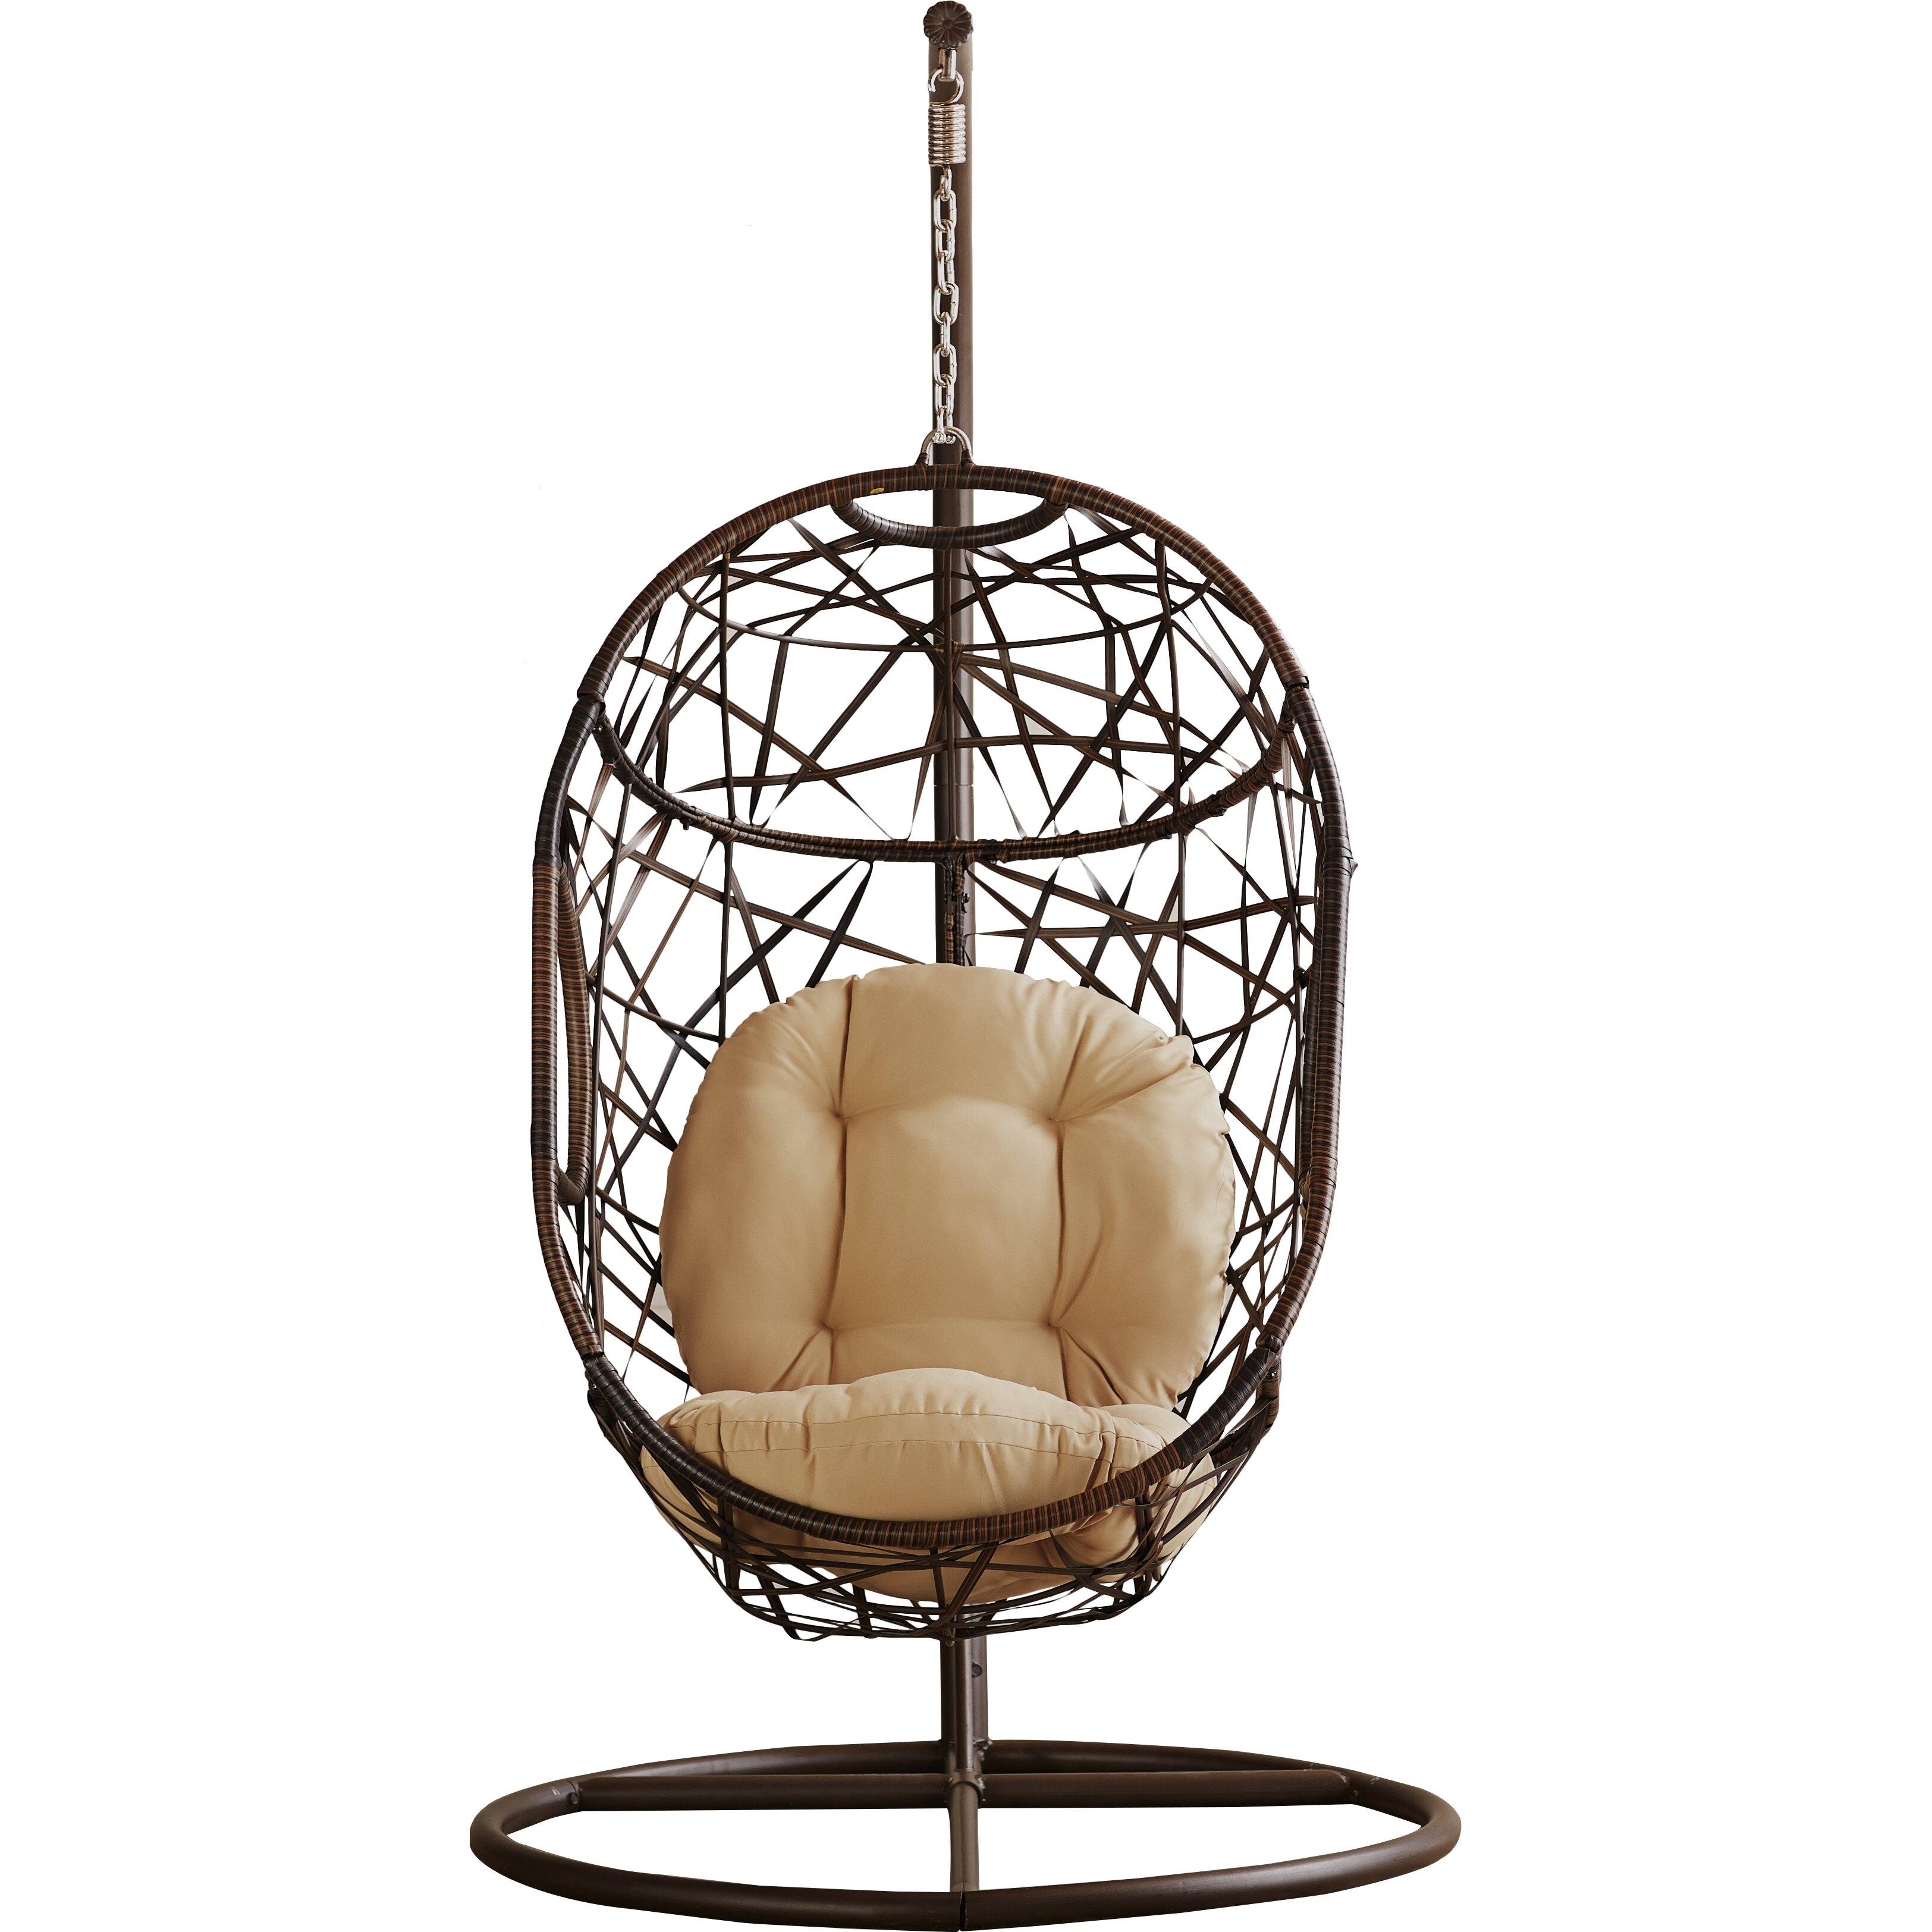 outdoor patio furniture chair hammocks bay isle home sku bayi1263